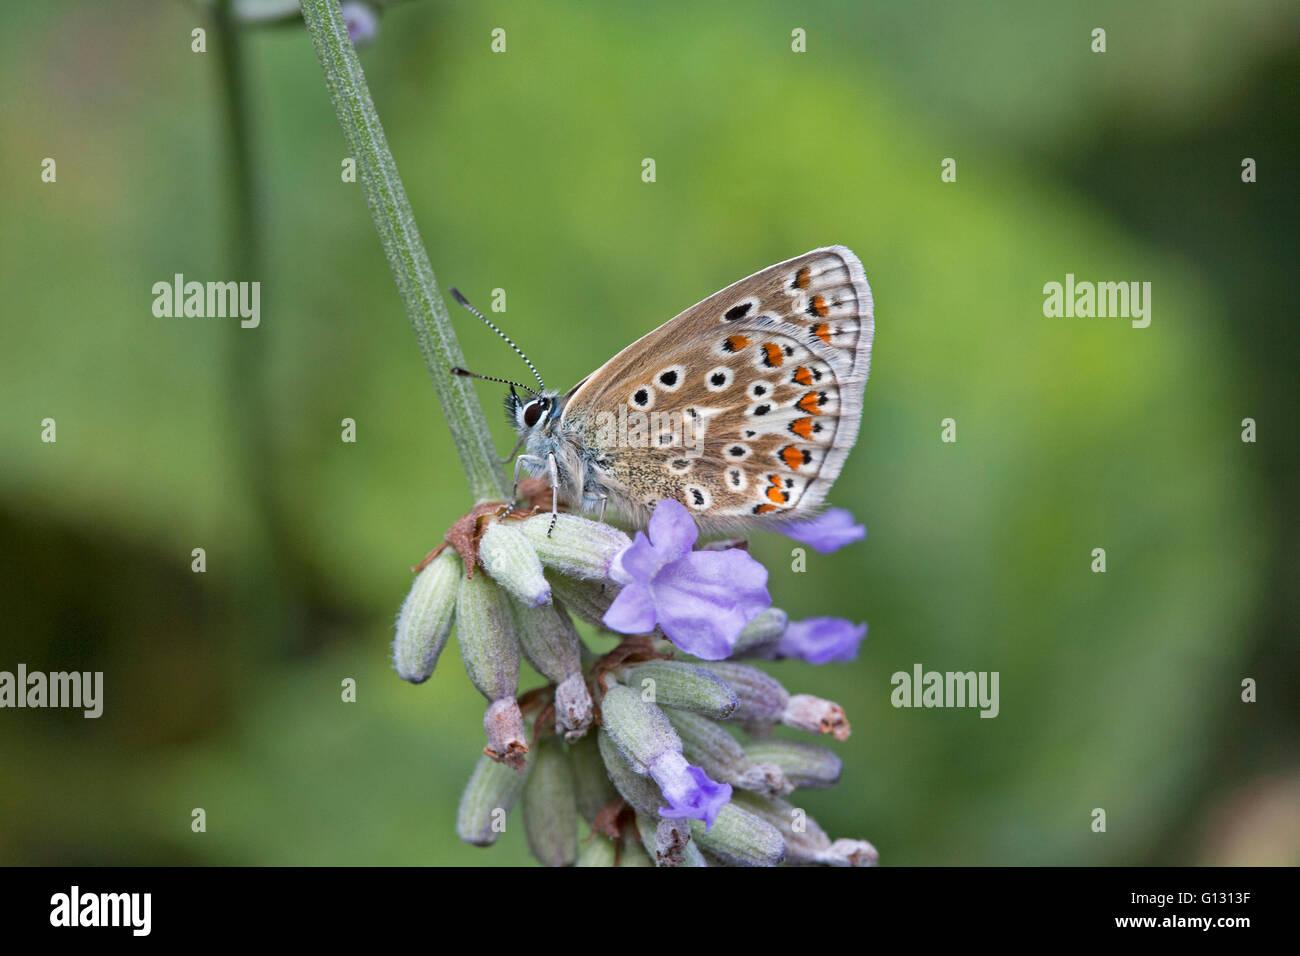 Mariposa Azul común Polyommatus icarus solo adulto alimentándose de flores de lavanda Essex, Reino Unido Imagen De Stock